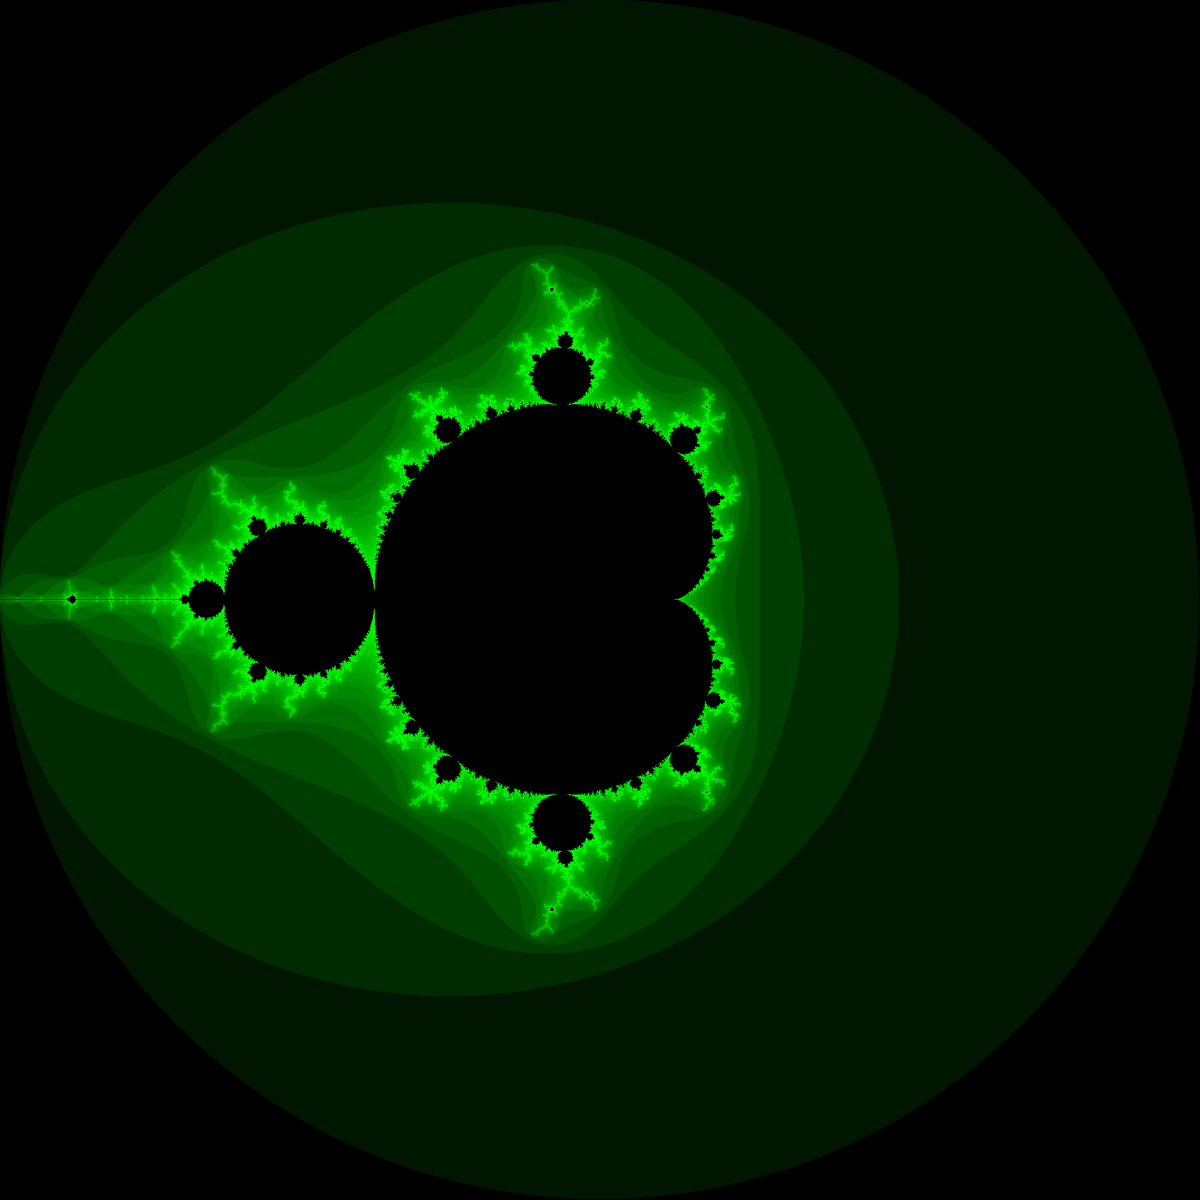 f:id:Hassium277:20210227232102p:plain